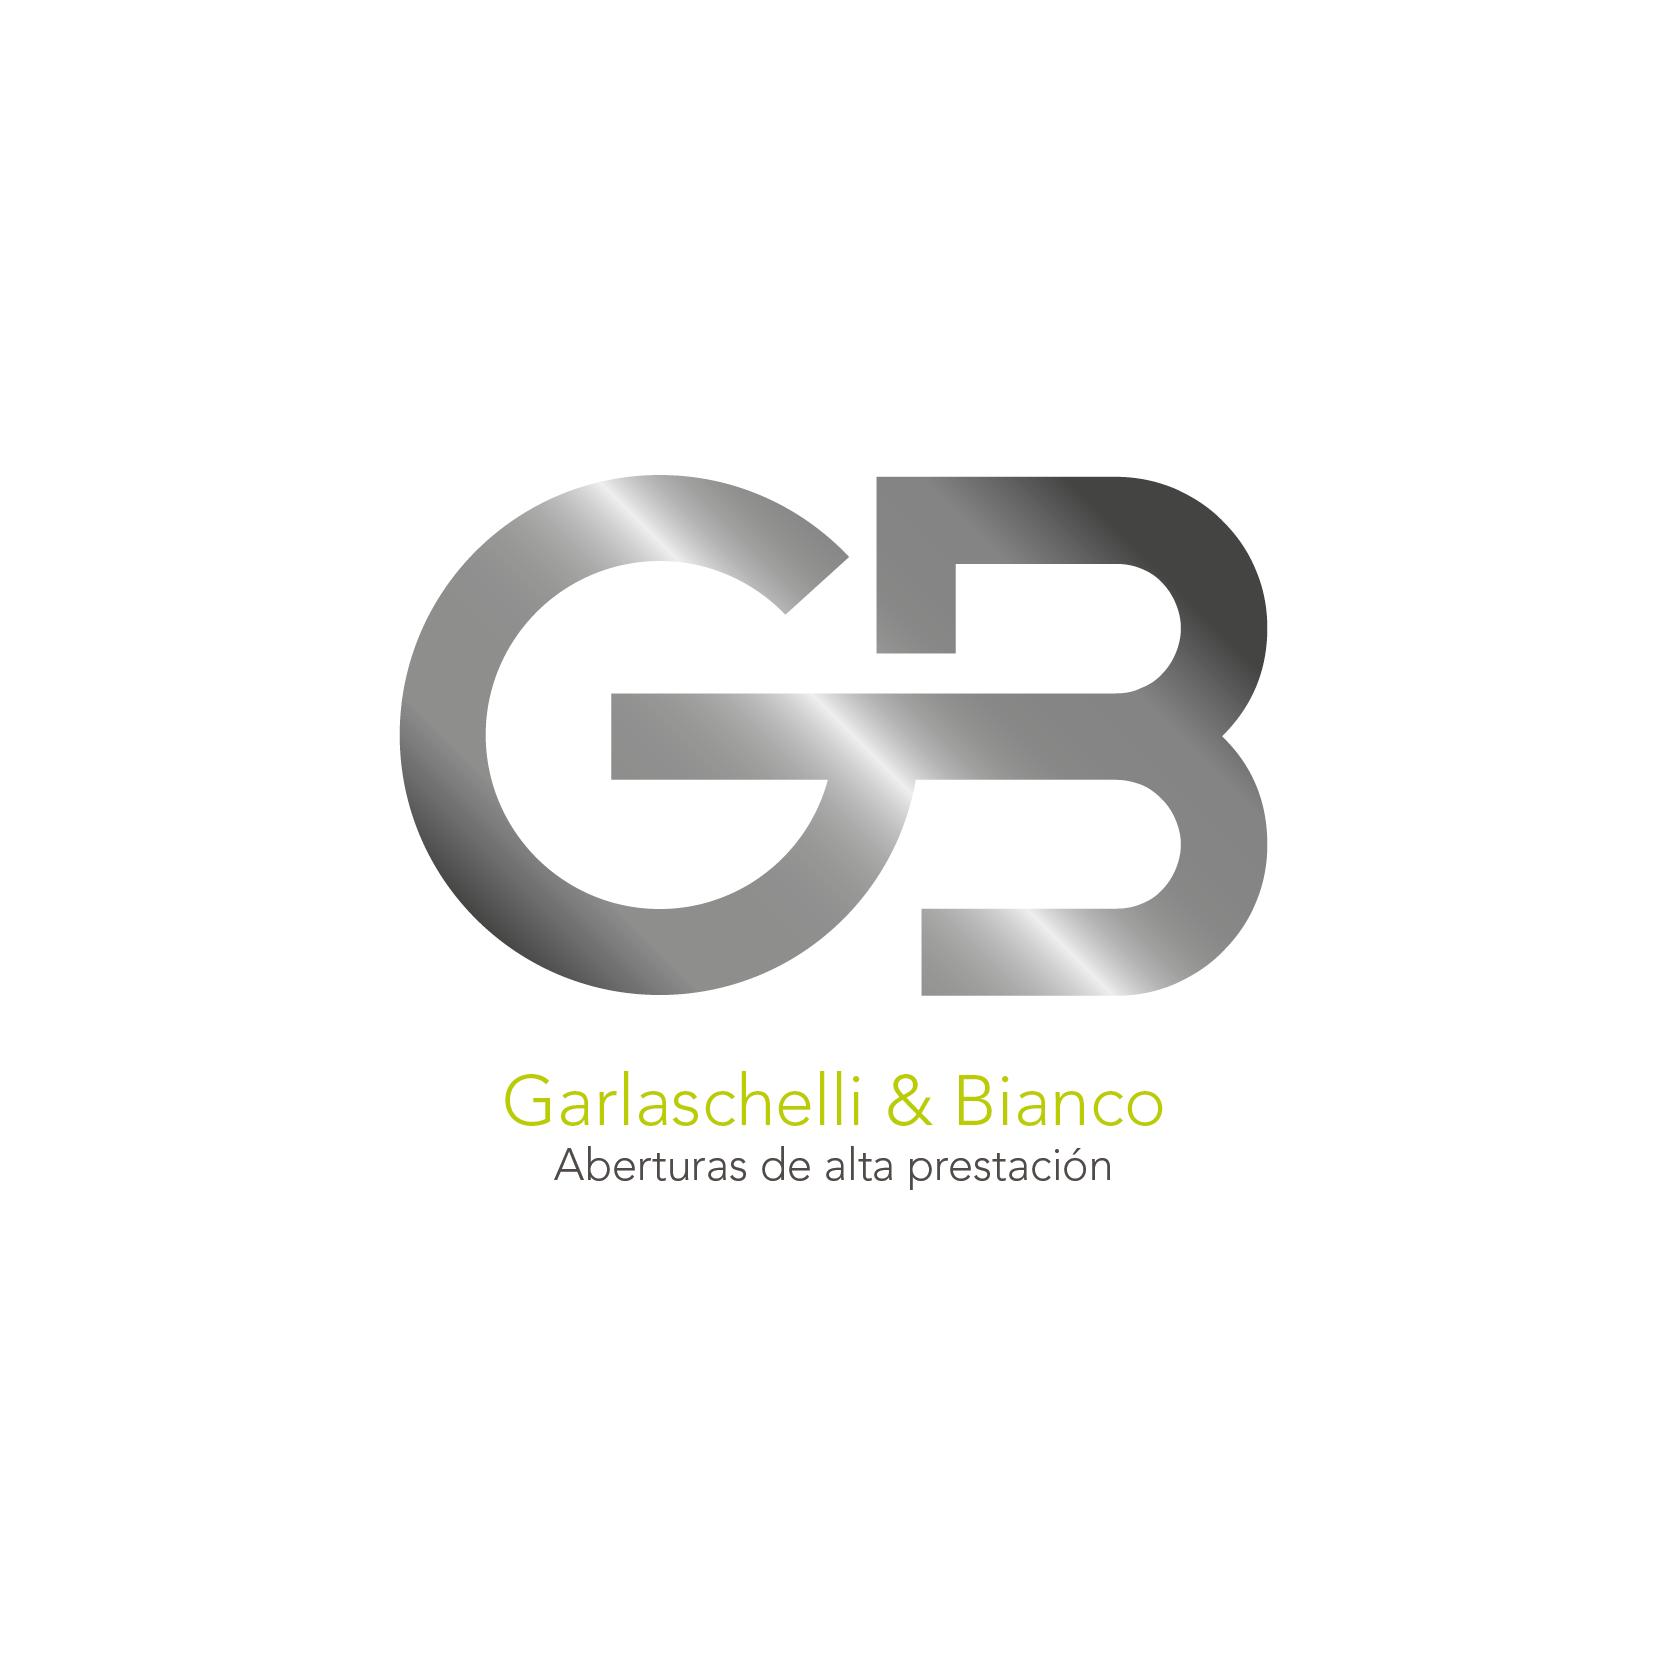 Diseño Isologotipo de Garlascheli & Bianco